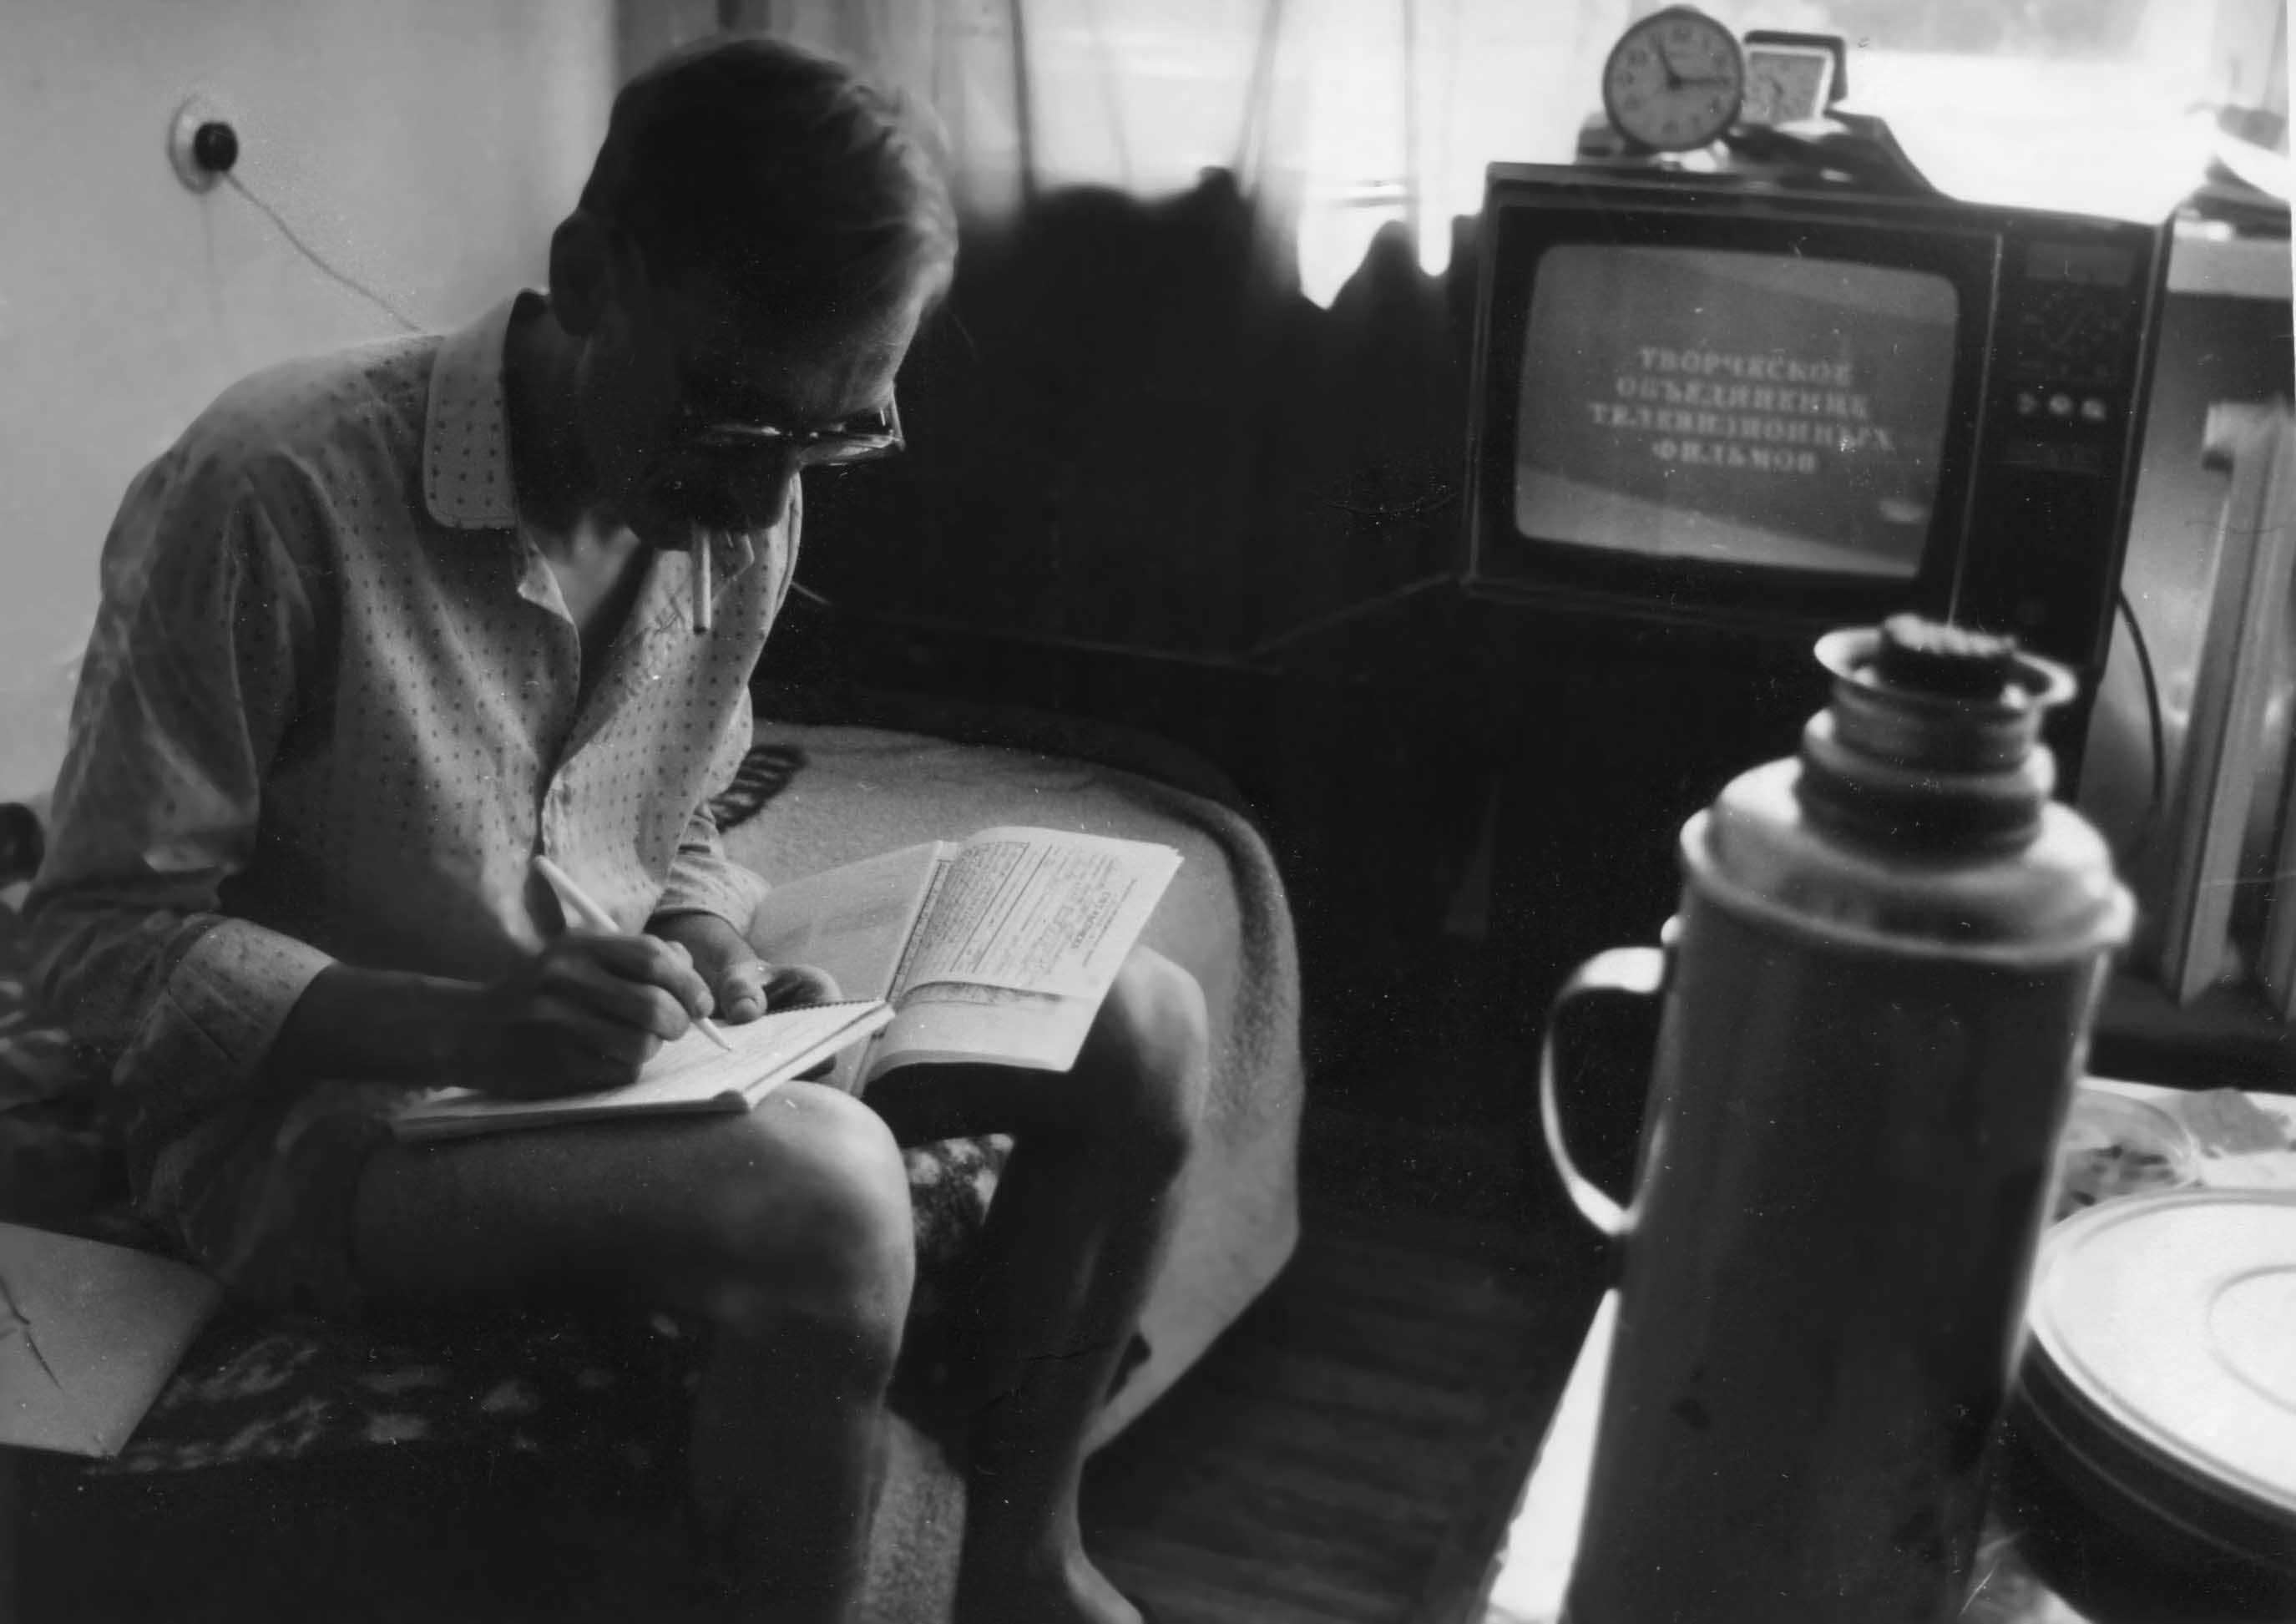 Экспонат #25. Во Владивостоке. 1983 год